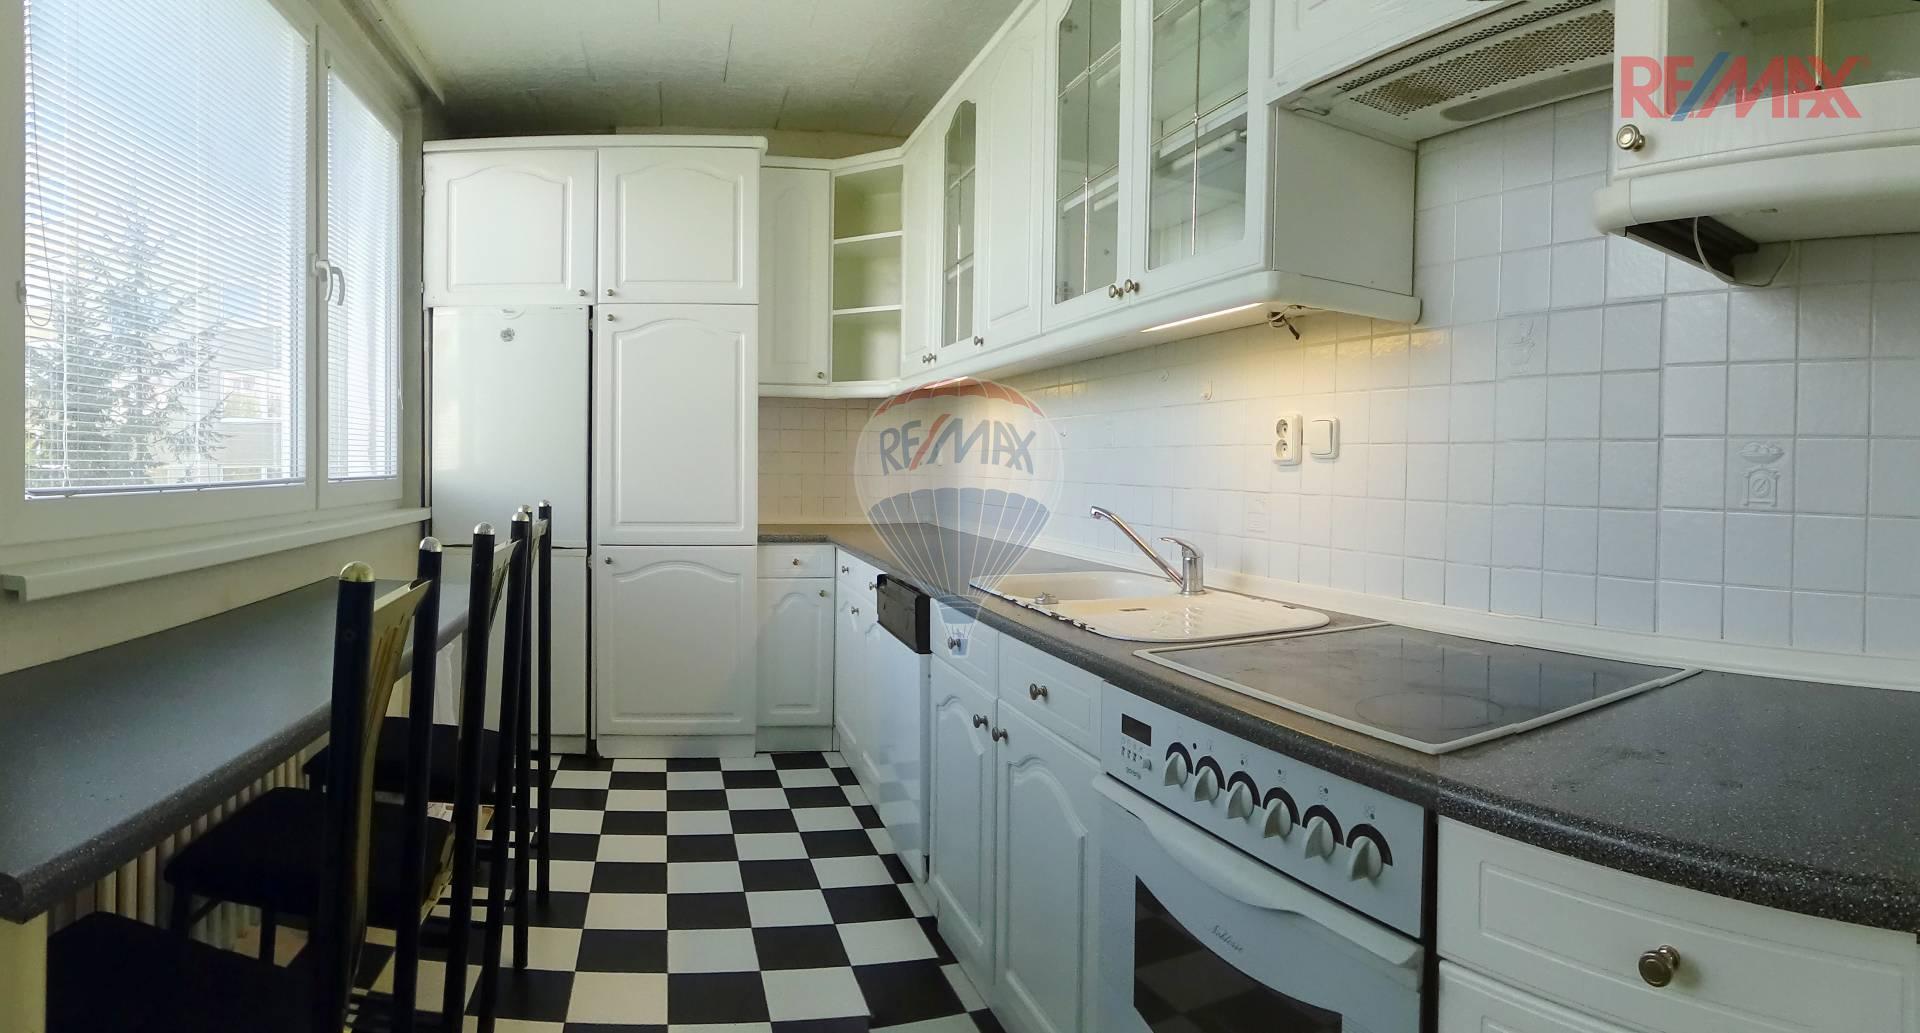 Byt 3+1 69 m2 + 3,5 m2 lodžie, Lamačova - Praha 5 - Hlubočepy